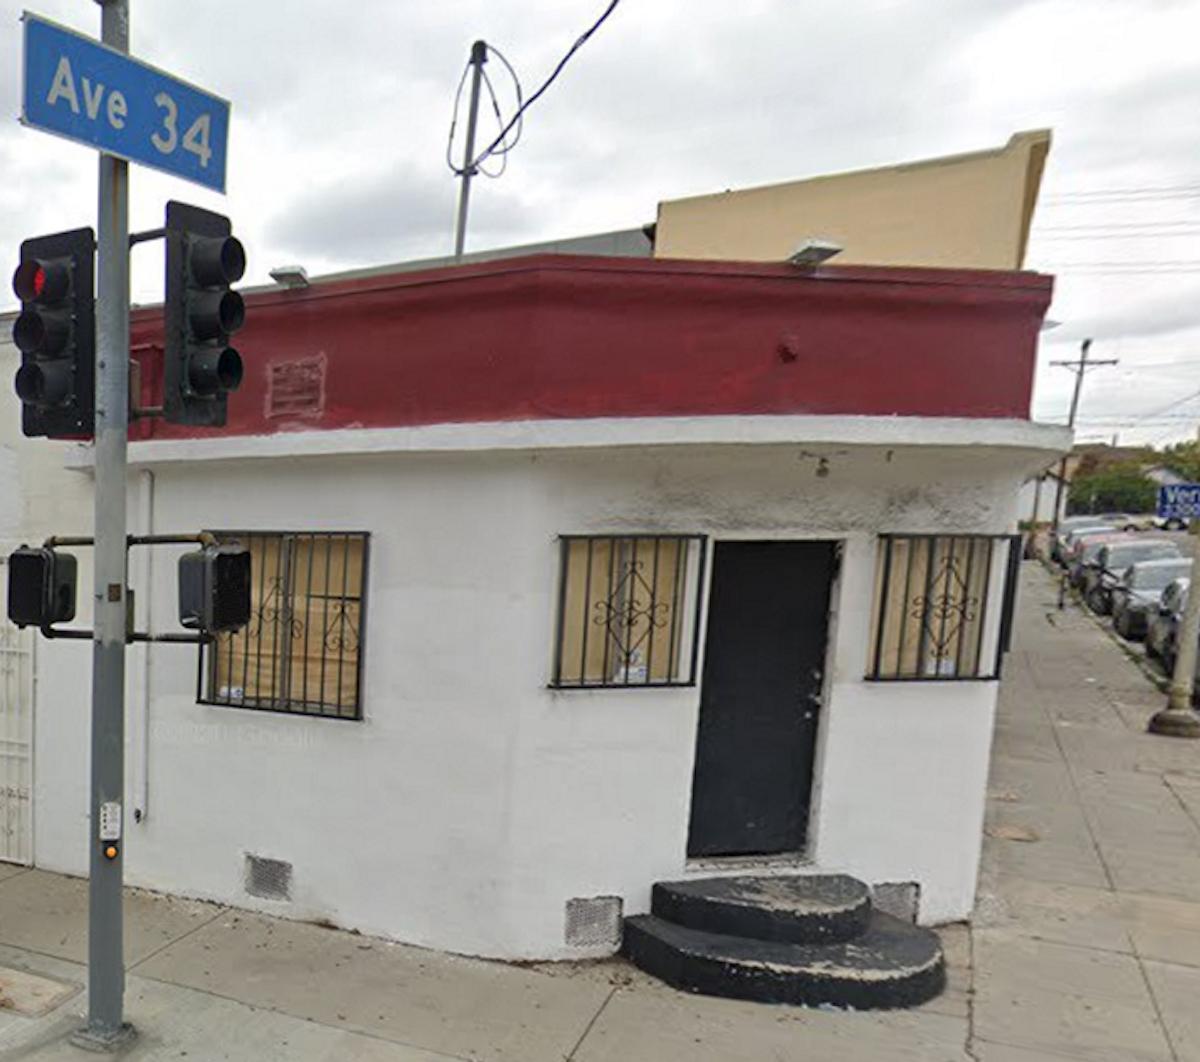 Ryan Sweeney Planning Glassell and General Near Verdugo Bar